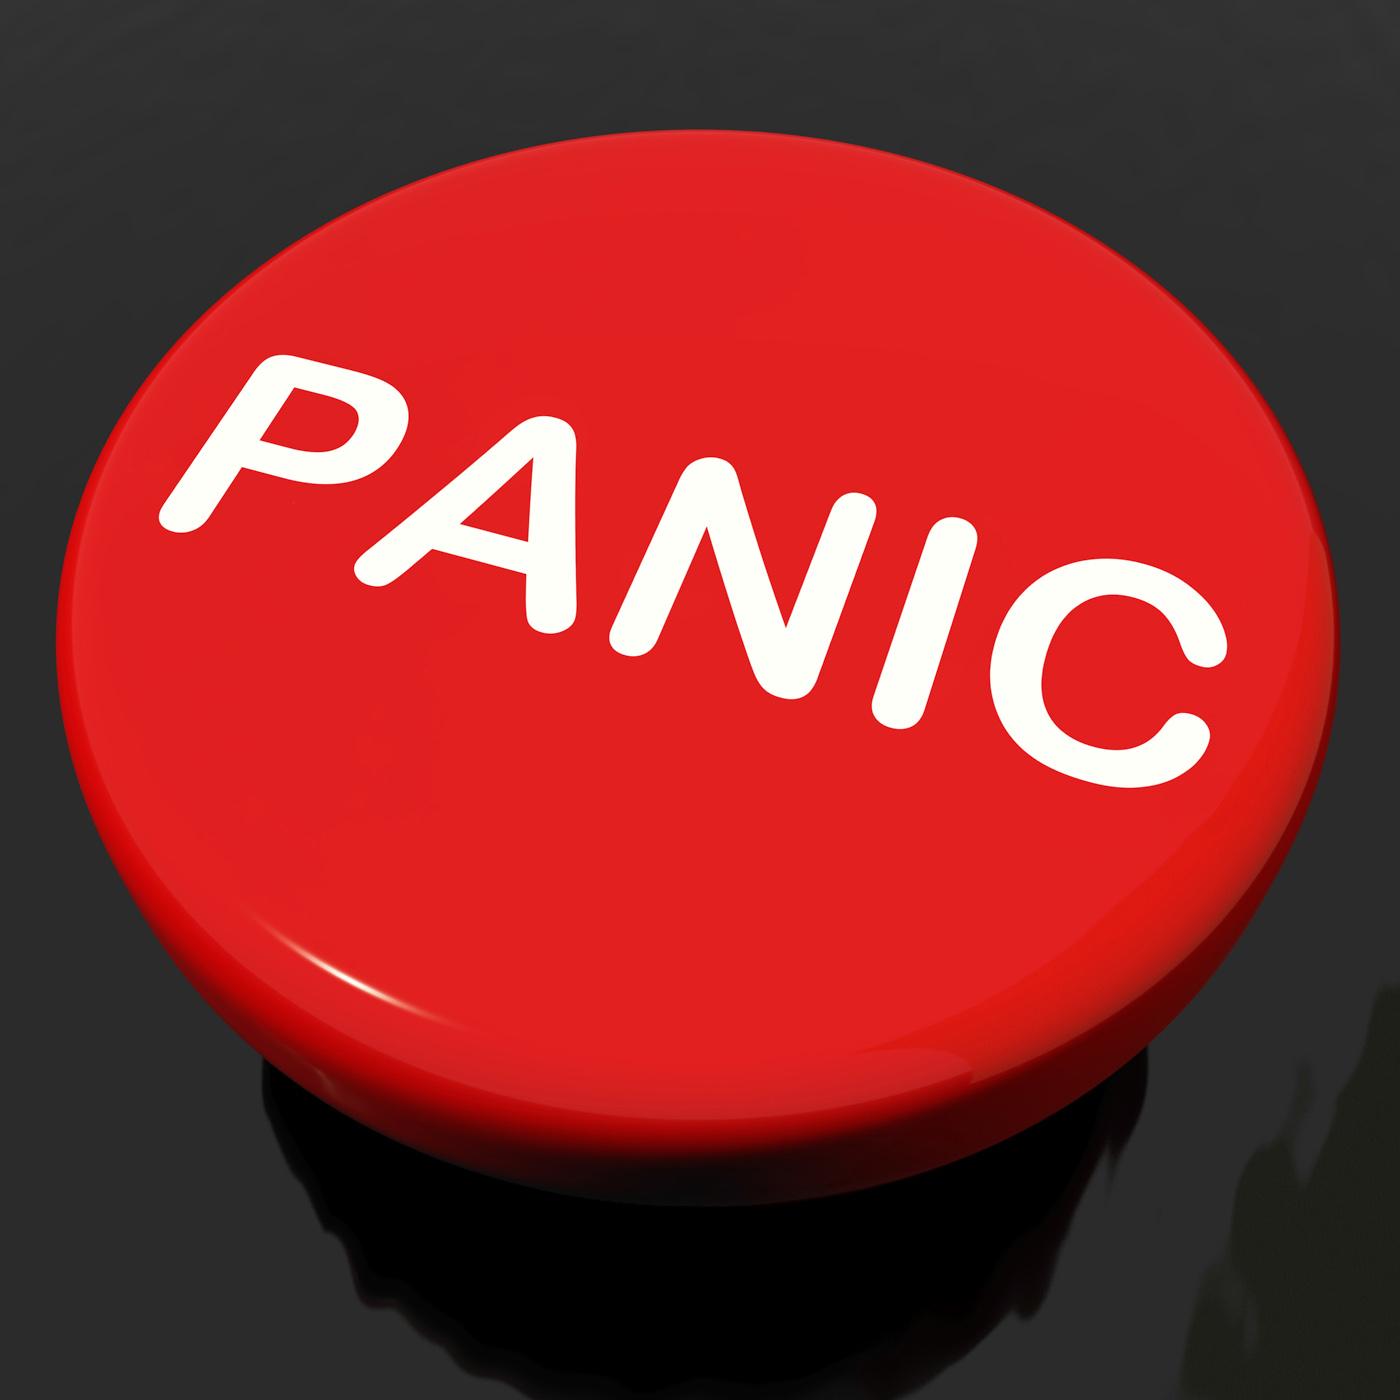 Panic button shows anxiety panicking distress photo